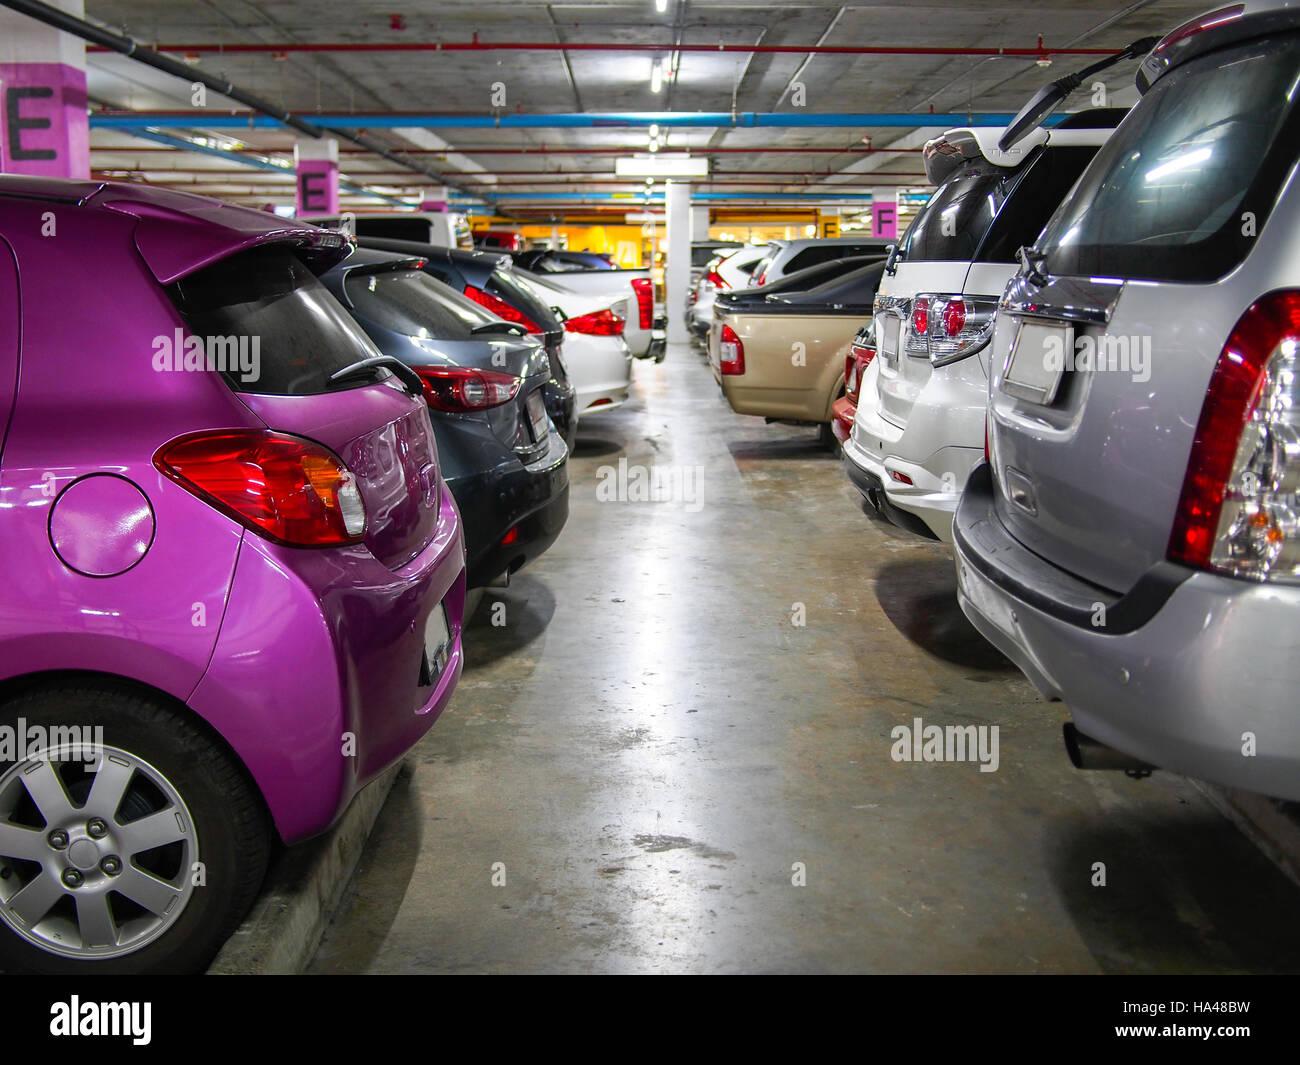 parking lot underground interior - Stock Image